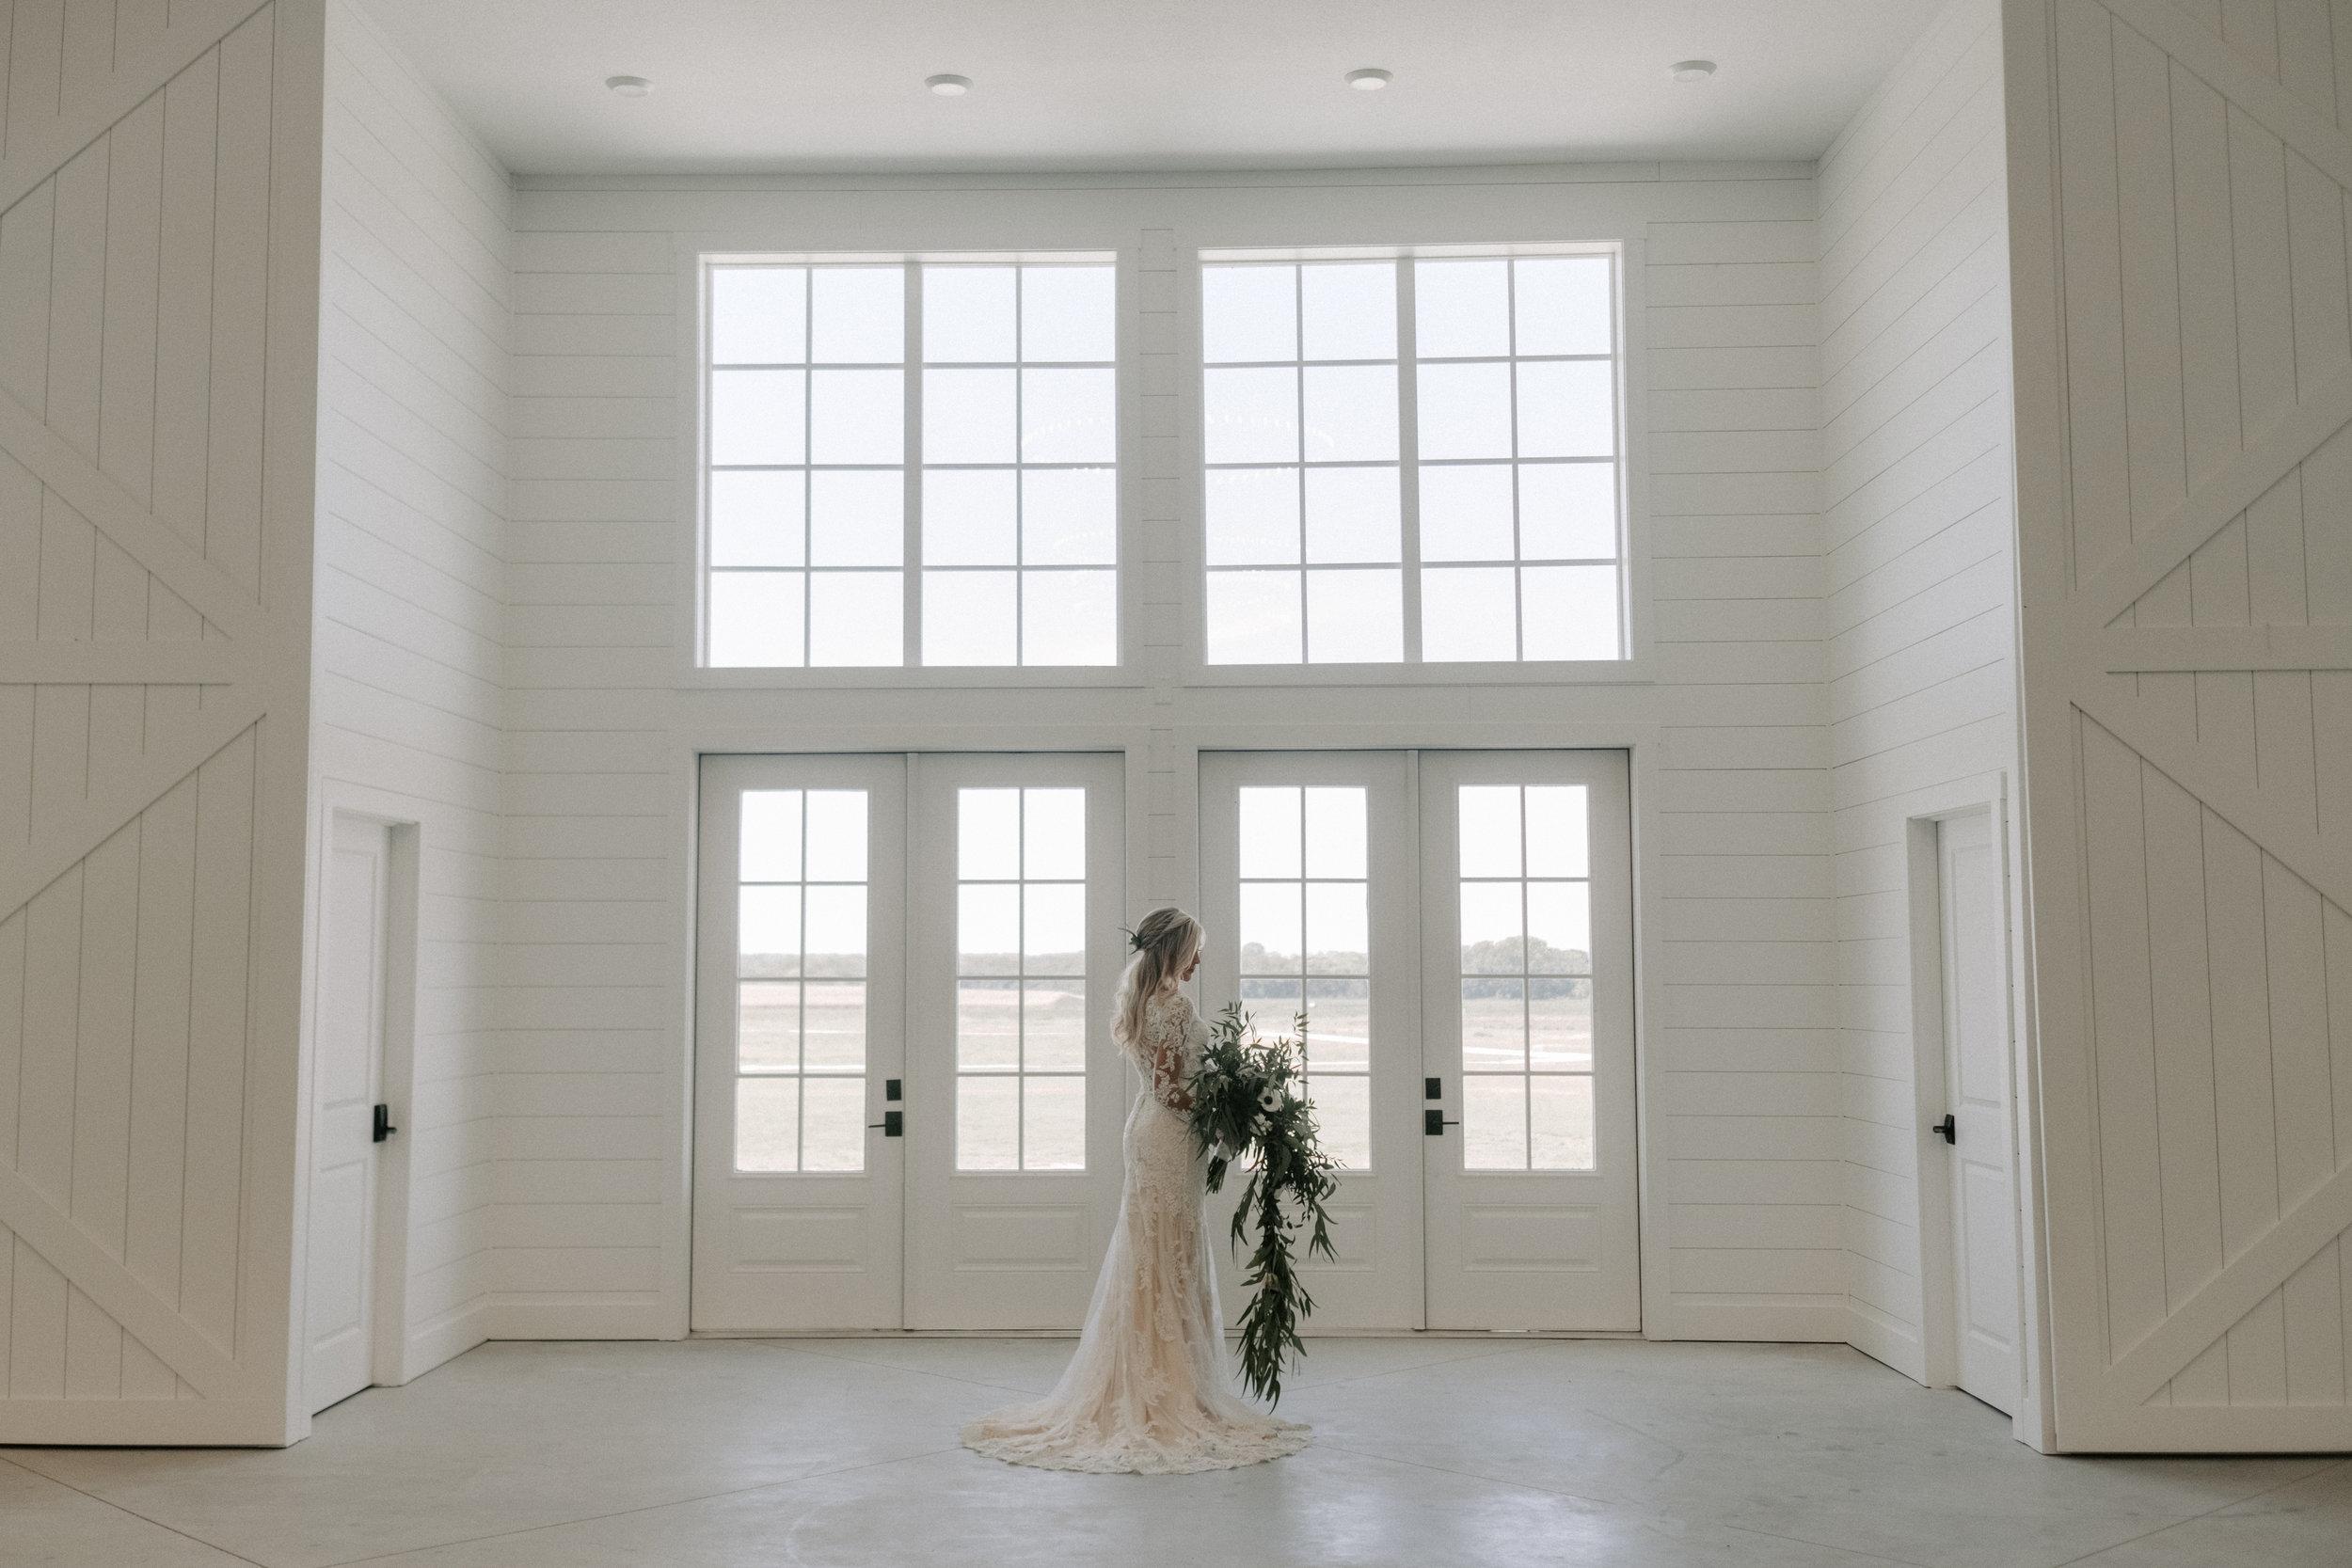 The-Barn-at-Grace-Hill-Wichita-Wedding-Venue-344.jpg